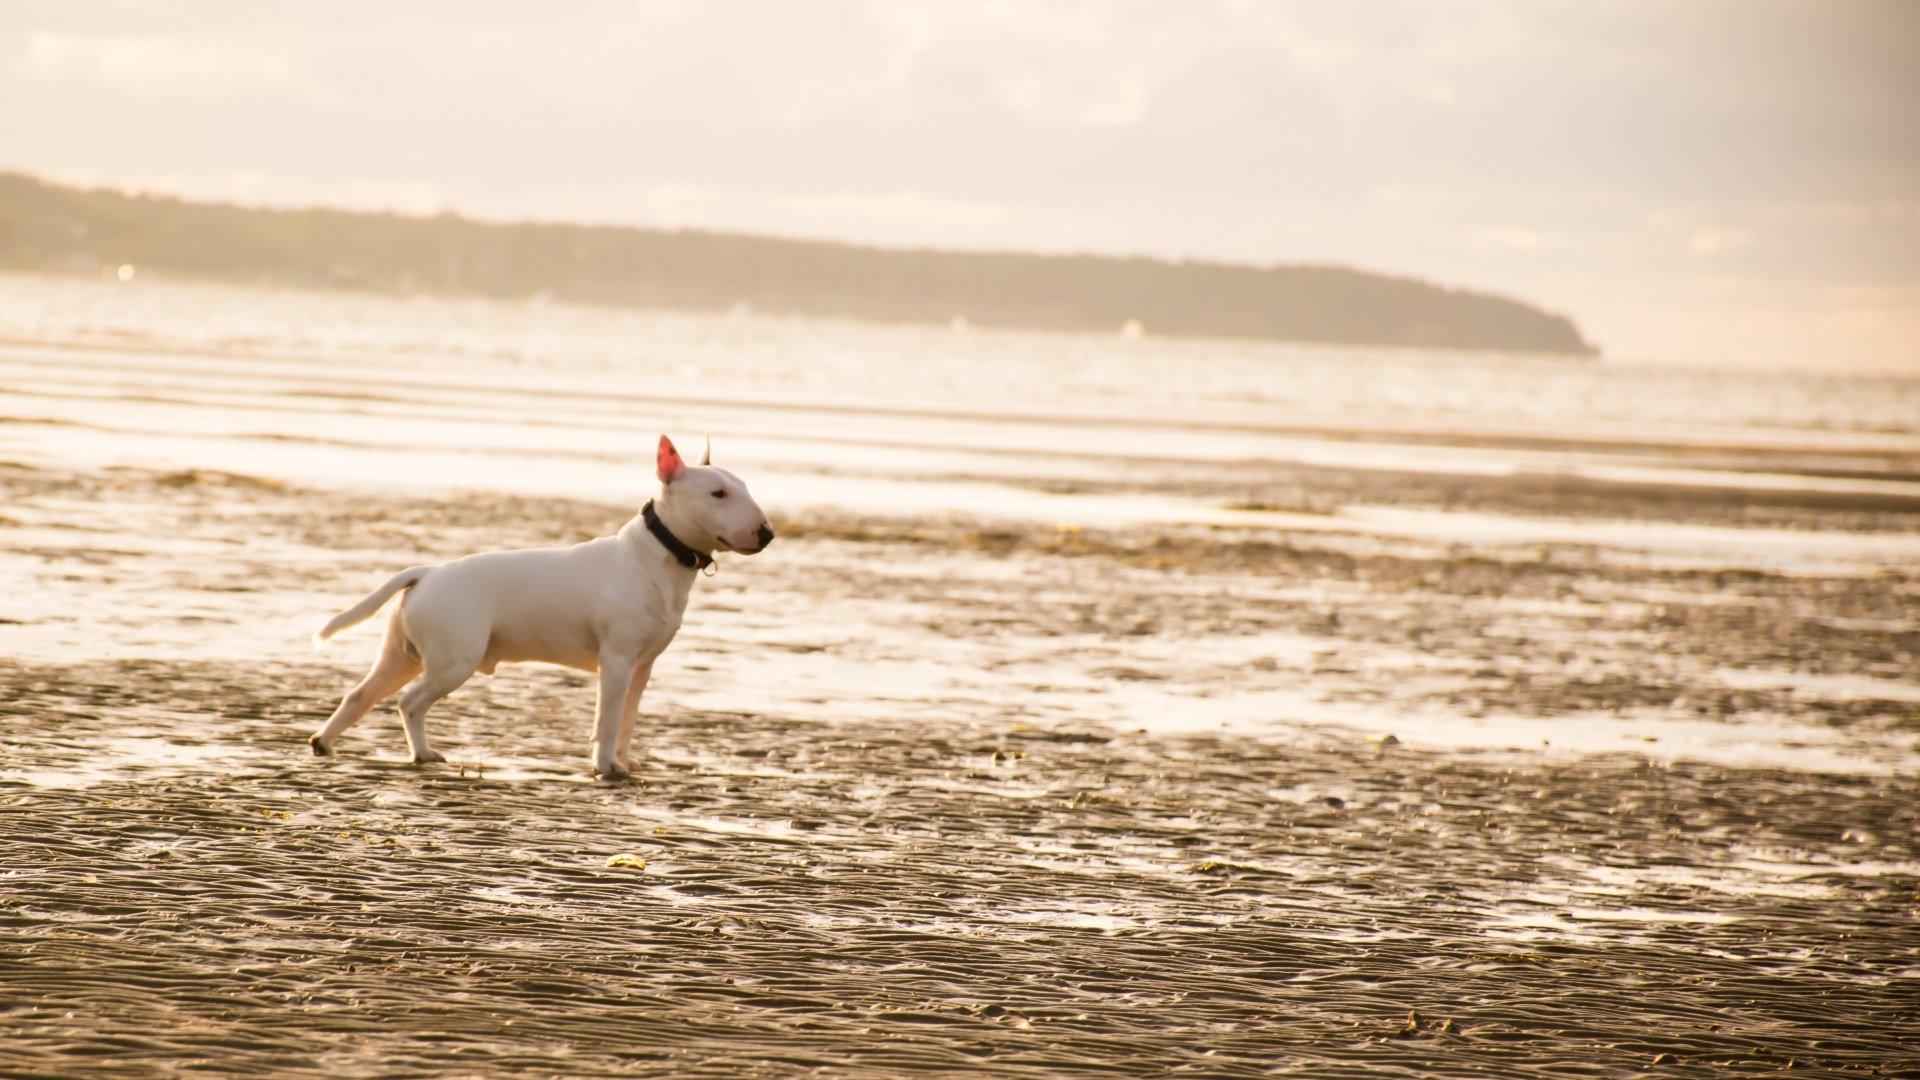 Hund am Strand, © Photo by Daniil Lebedev on Unsplash